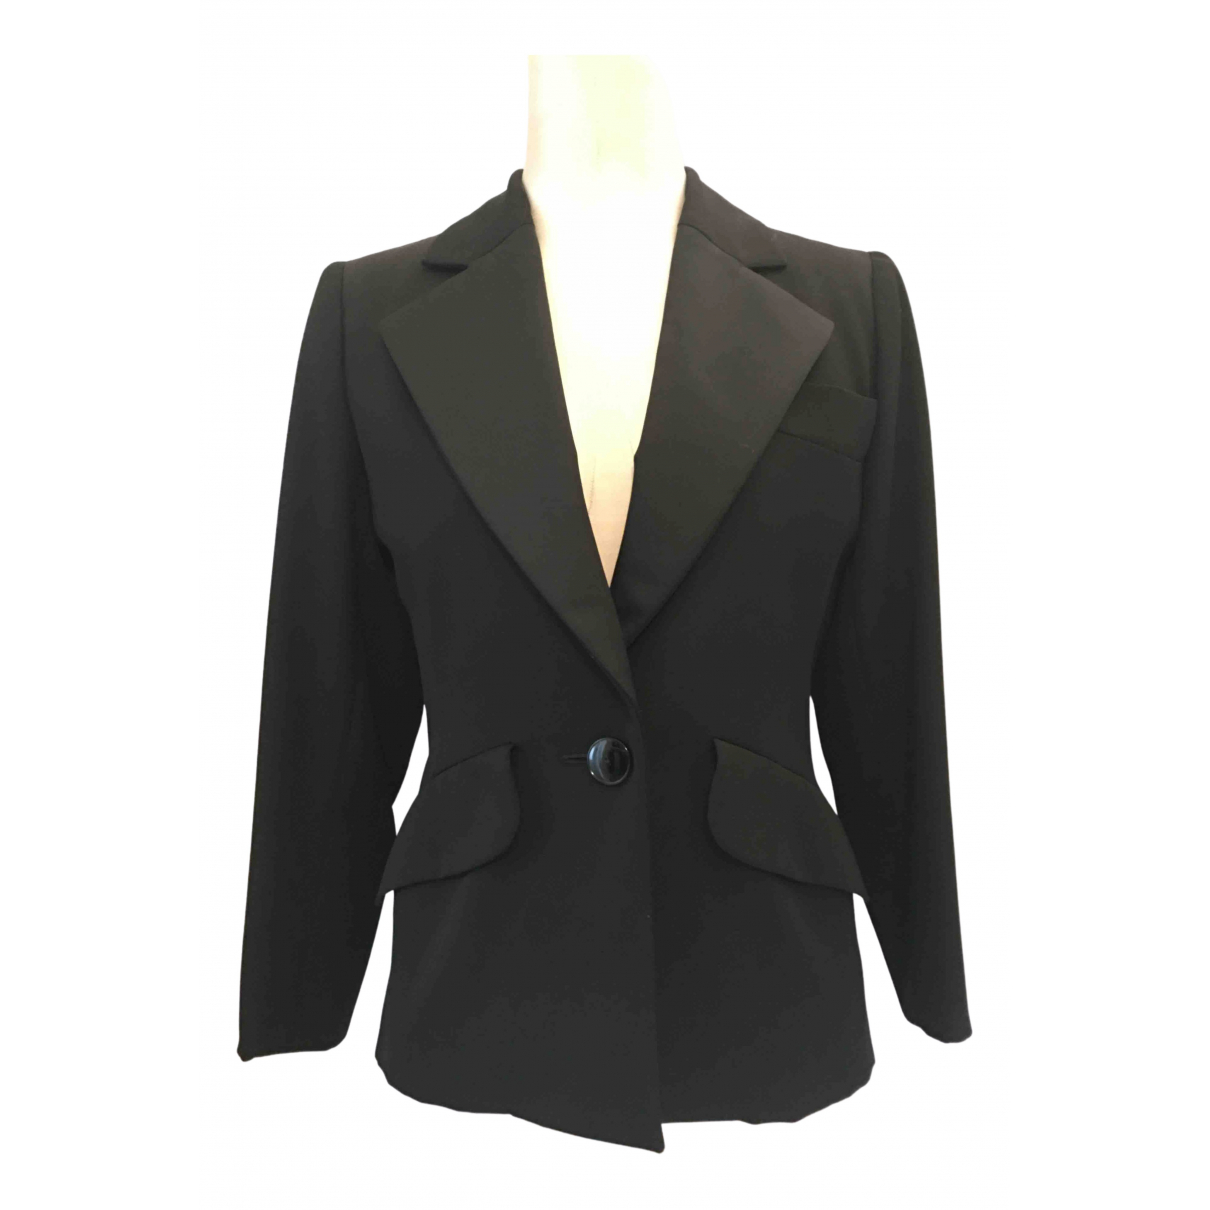 Yves Saint Laurent N Black Wool jacket for Women 36 FR